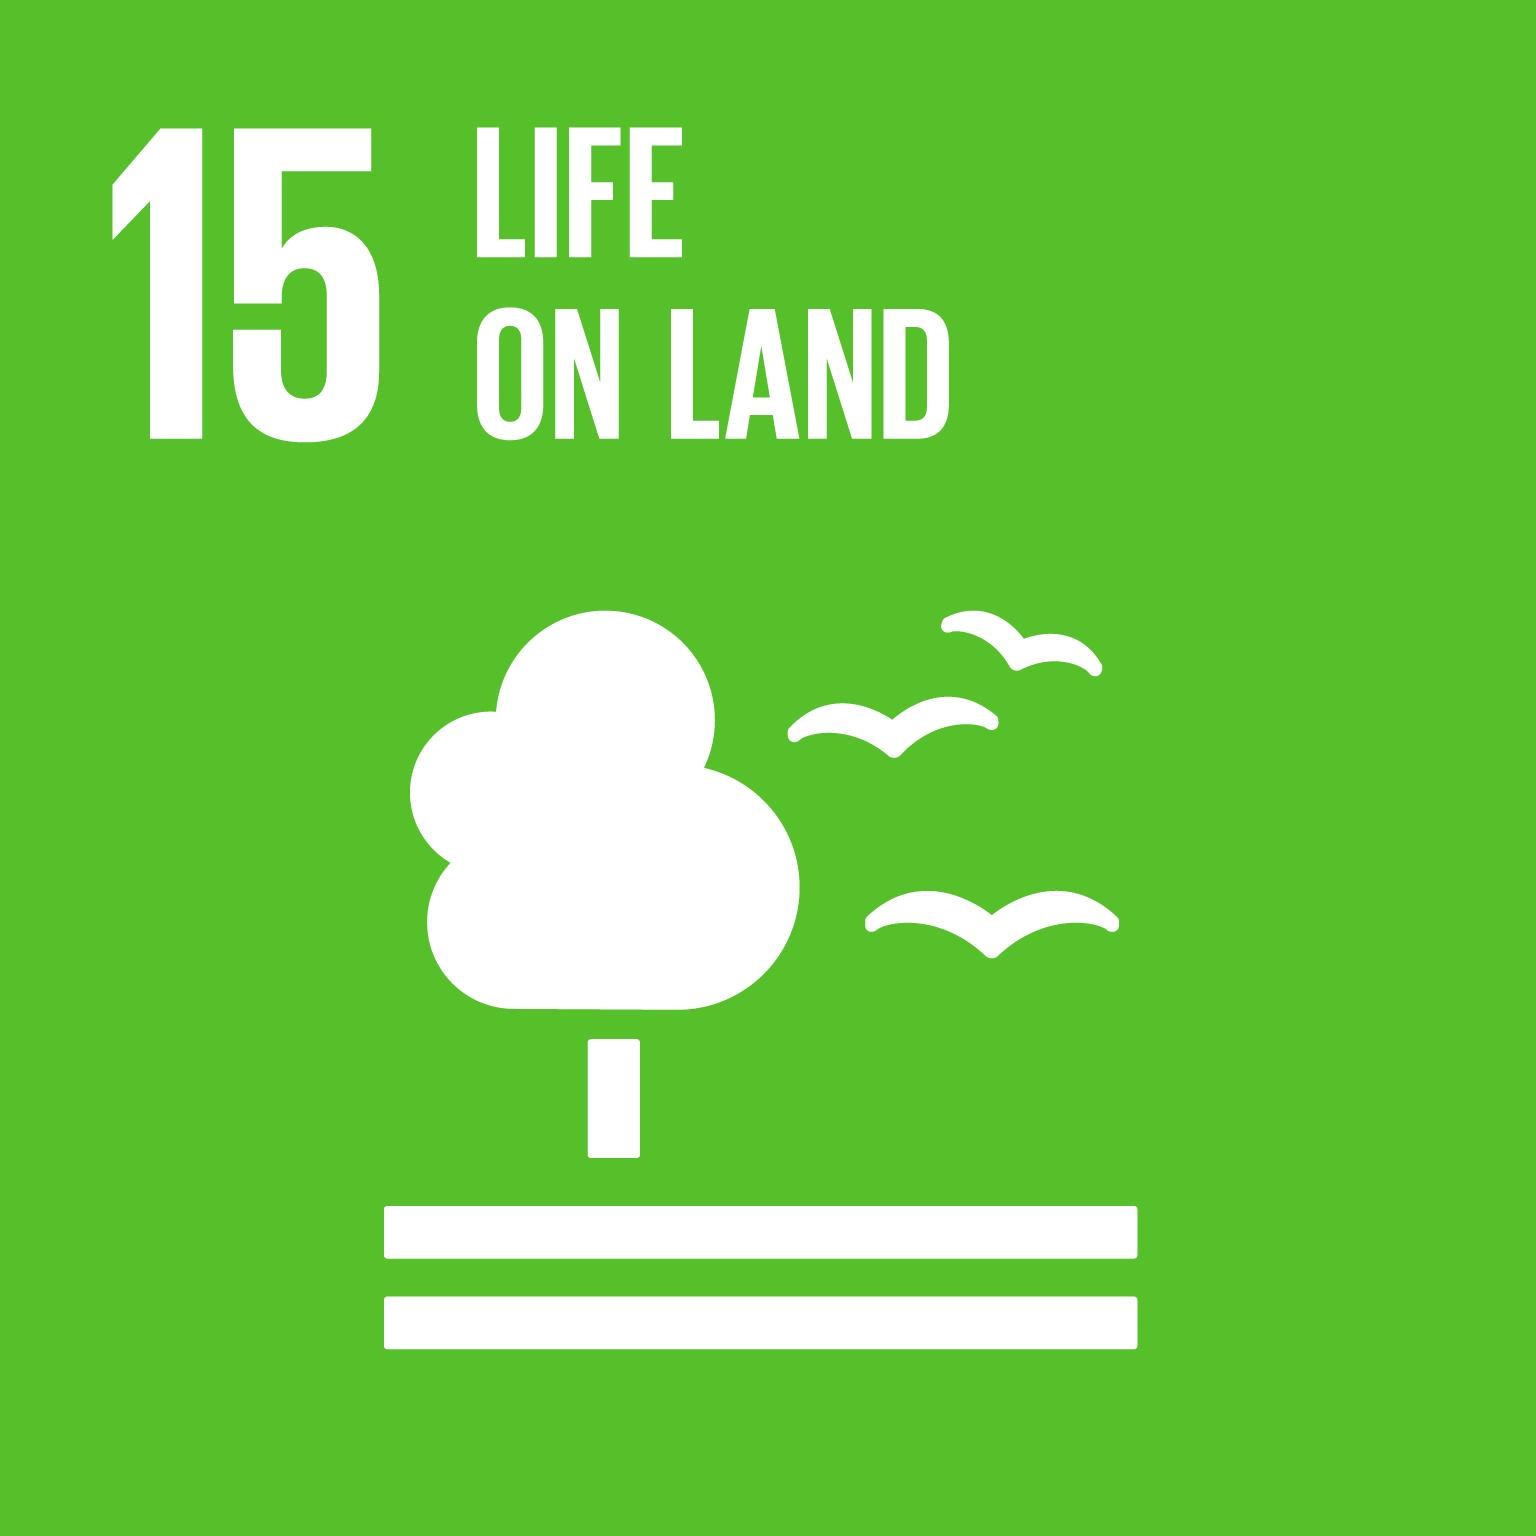 15 life on land